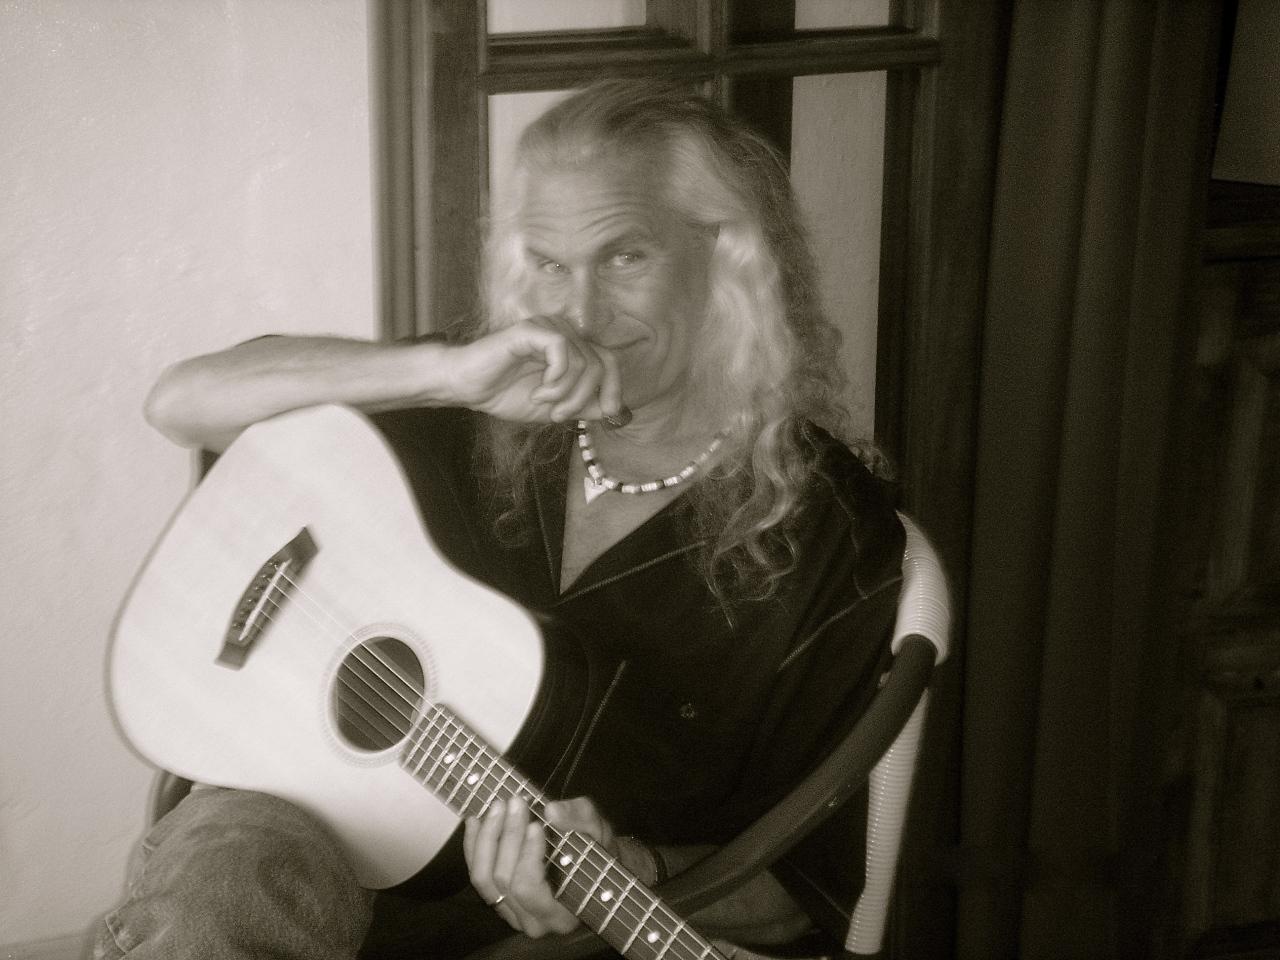 Chick Petersen and his guitar Photo by Deborah Parrish